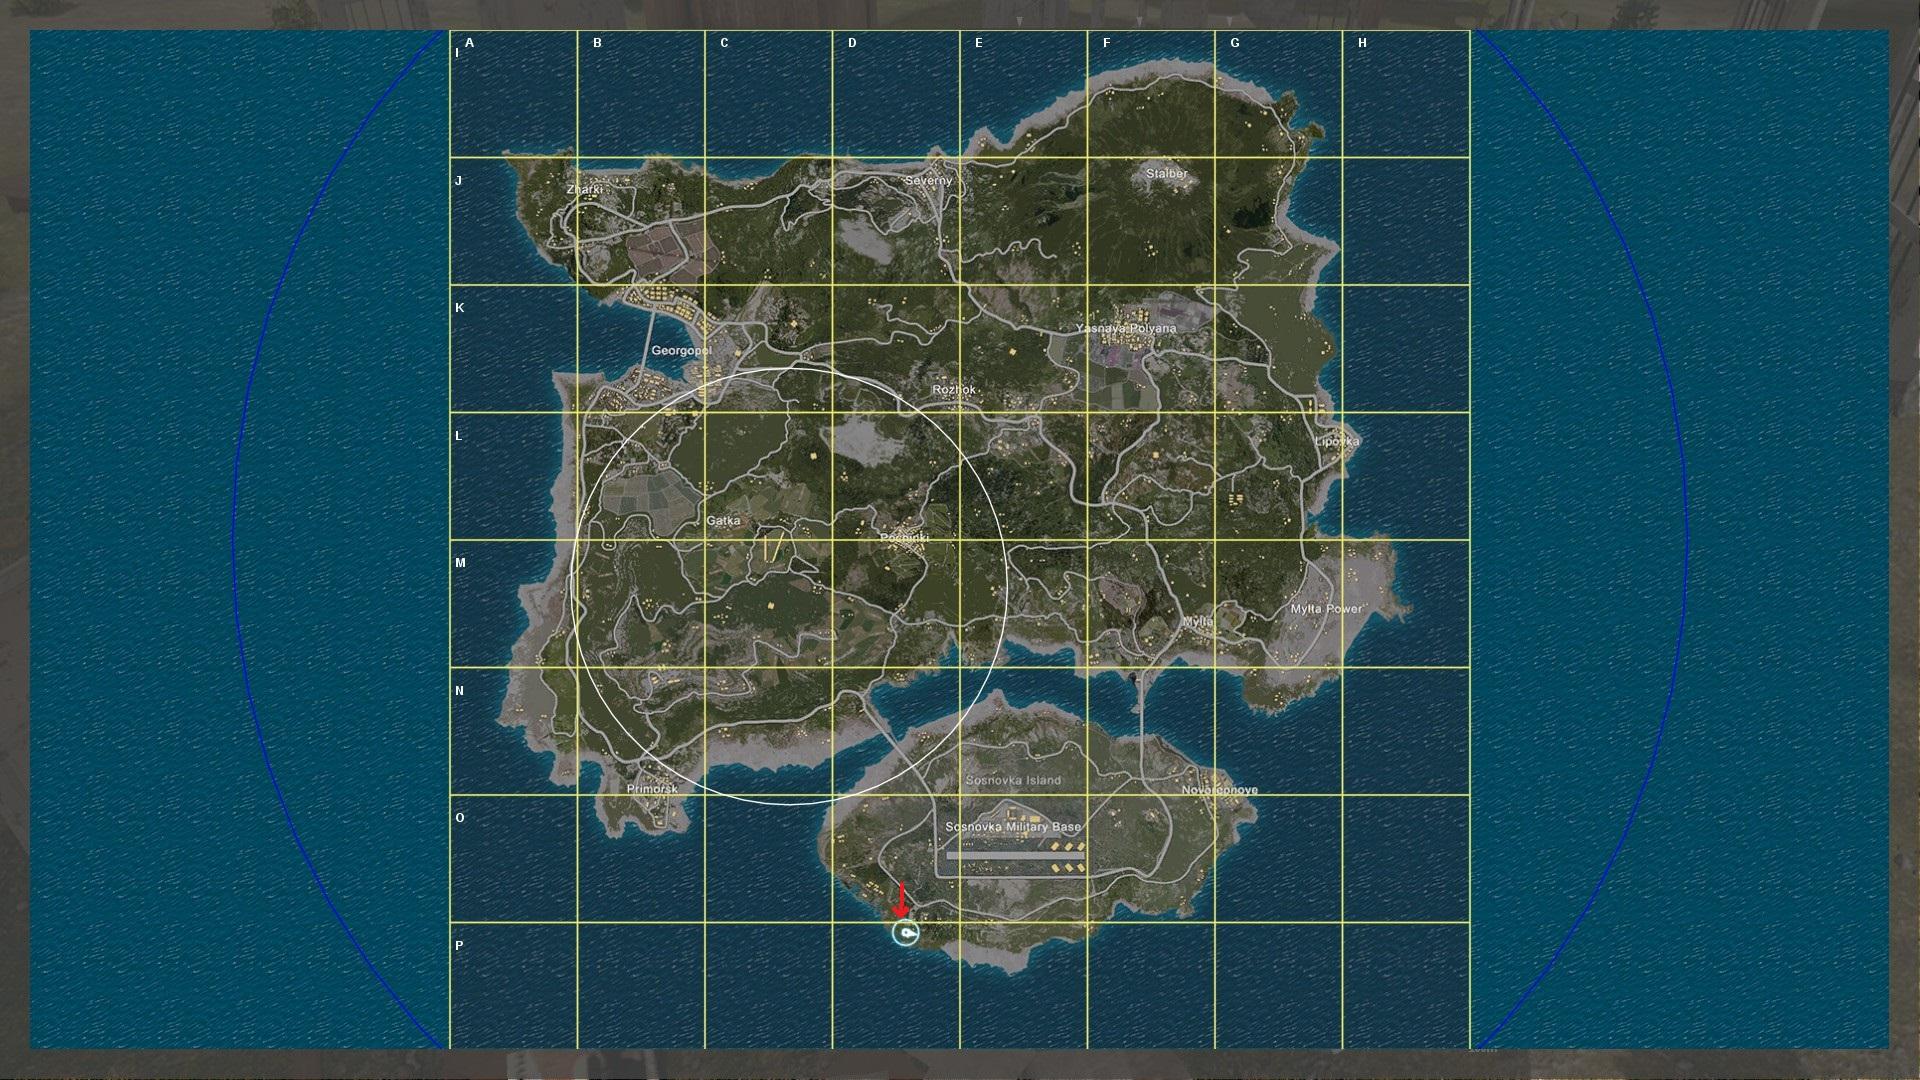 pubg-map.jpg